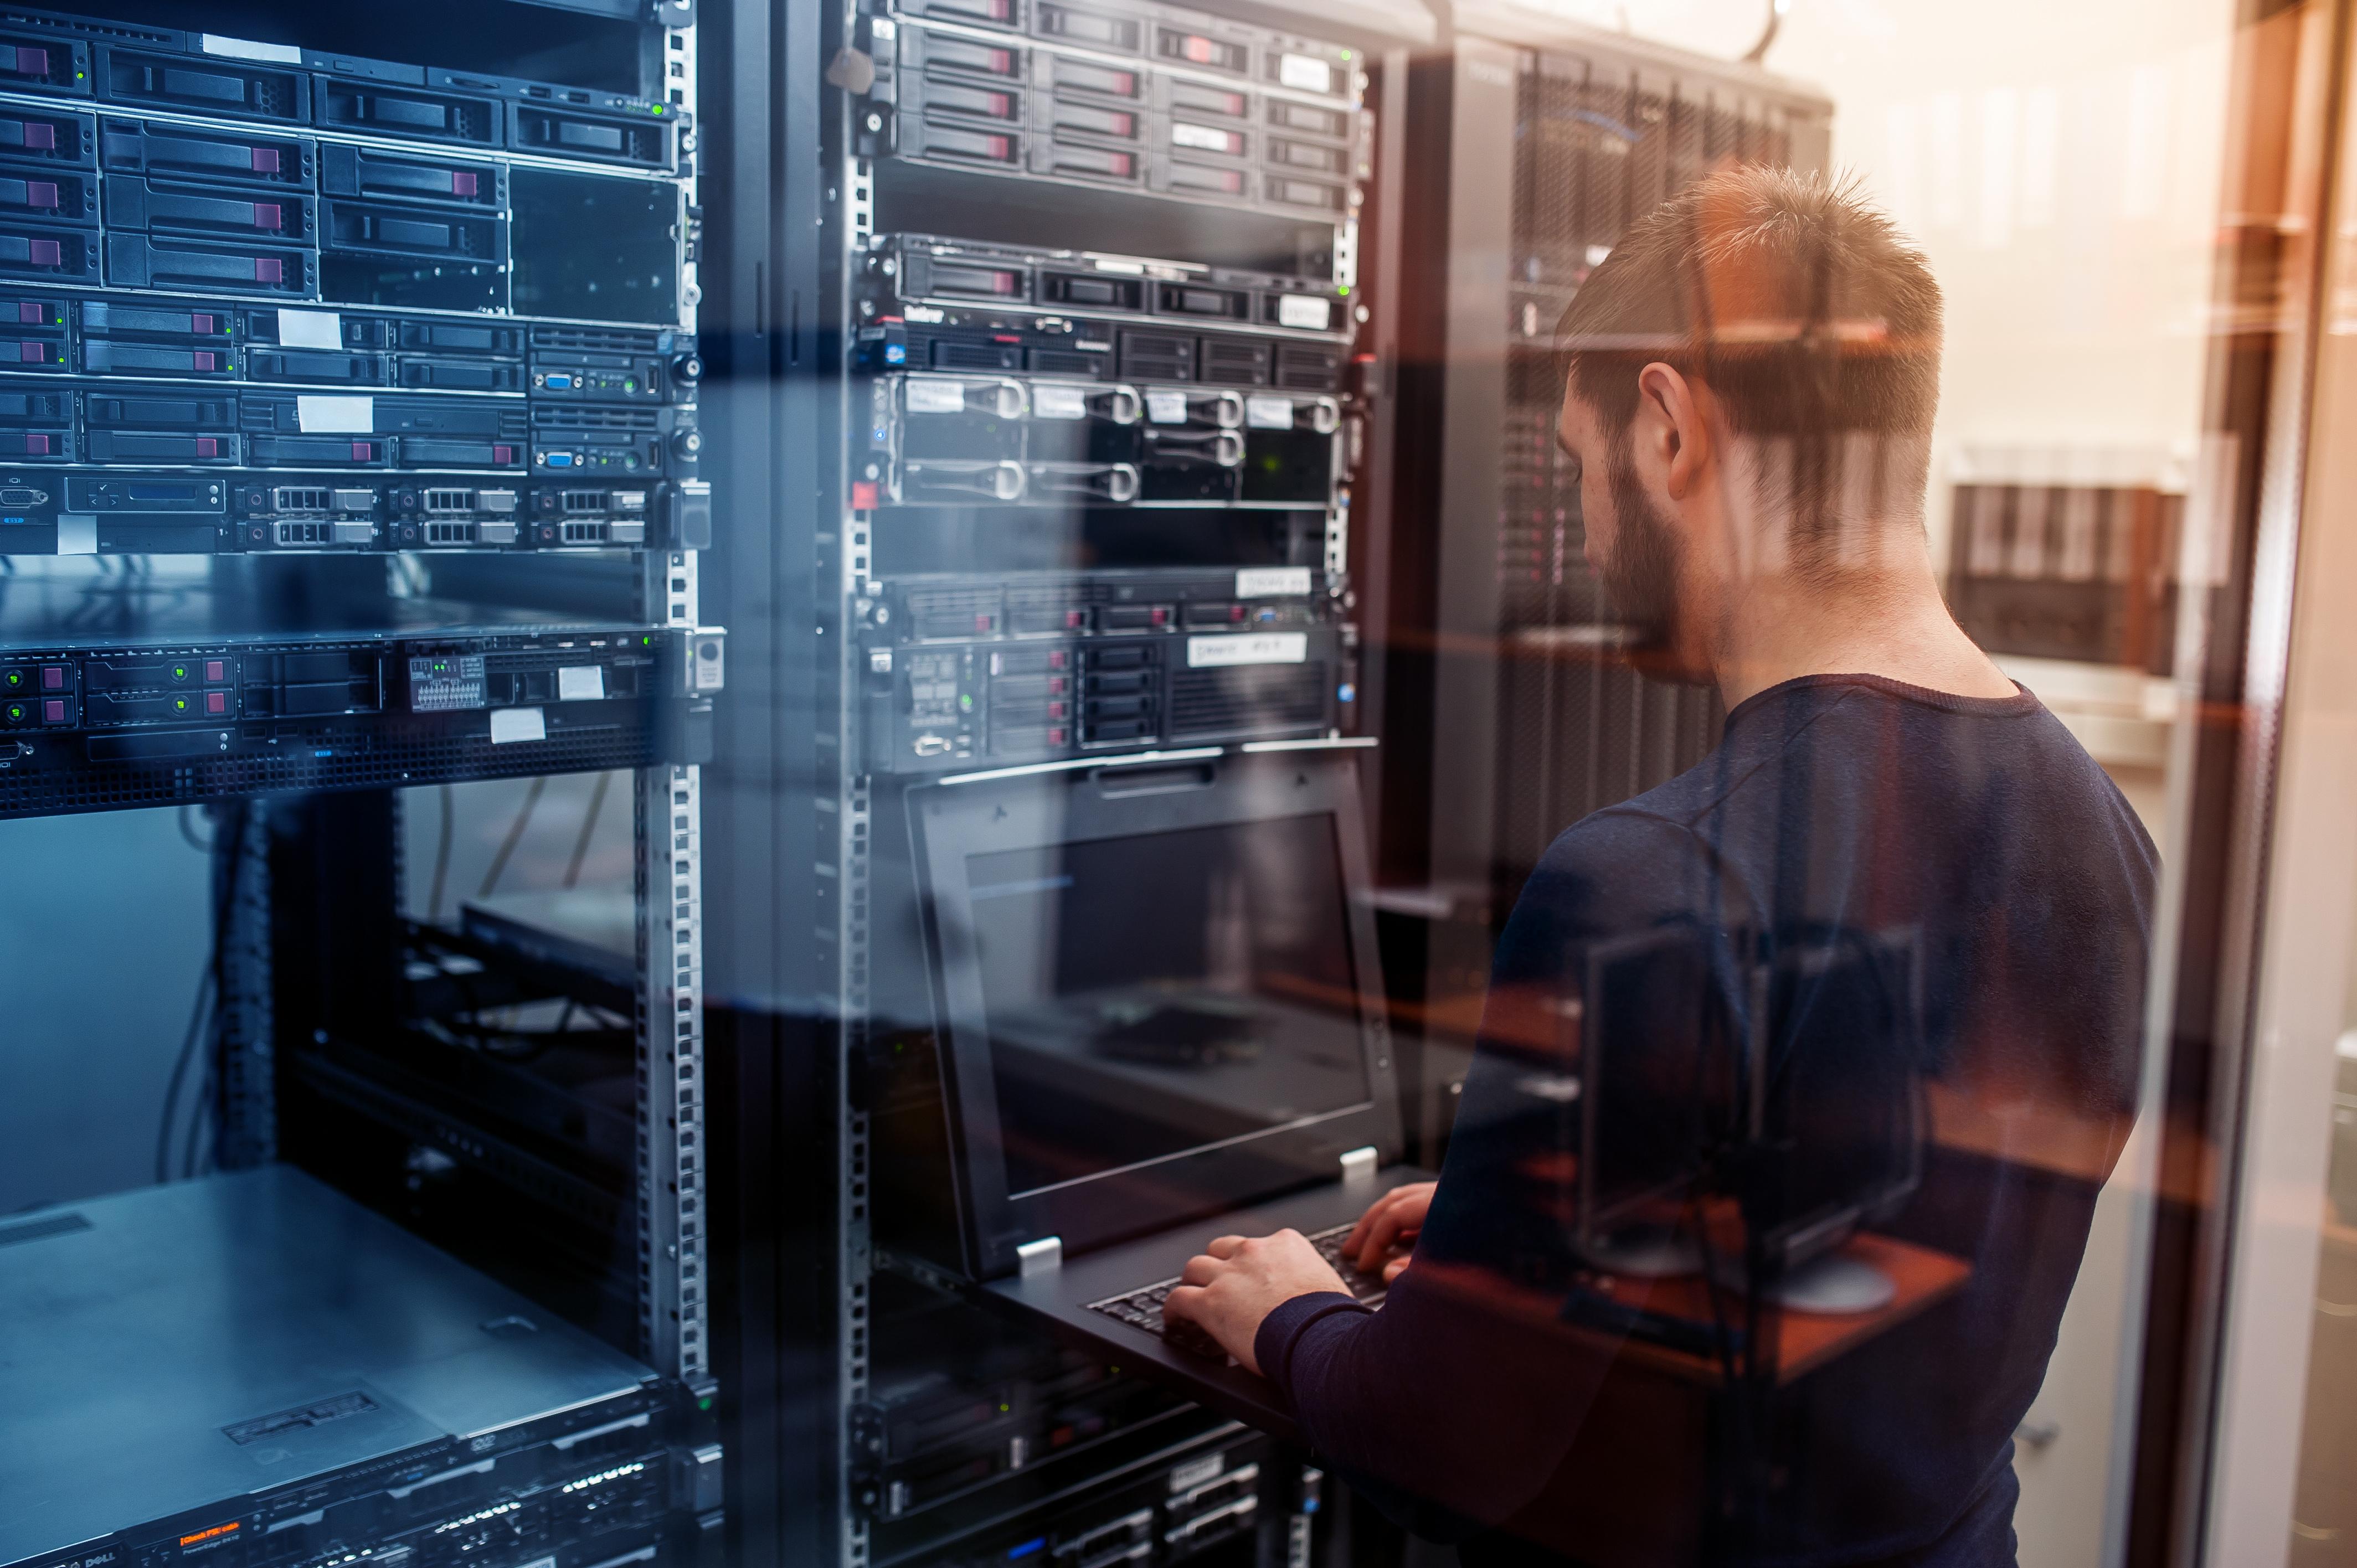 AdobeStock 136283864 - WordPress個人ブログ運営におすすめの安いレンタルサーバーは?設定から移行方法まで初心者に解説